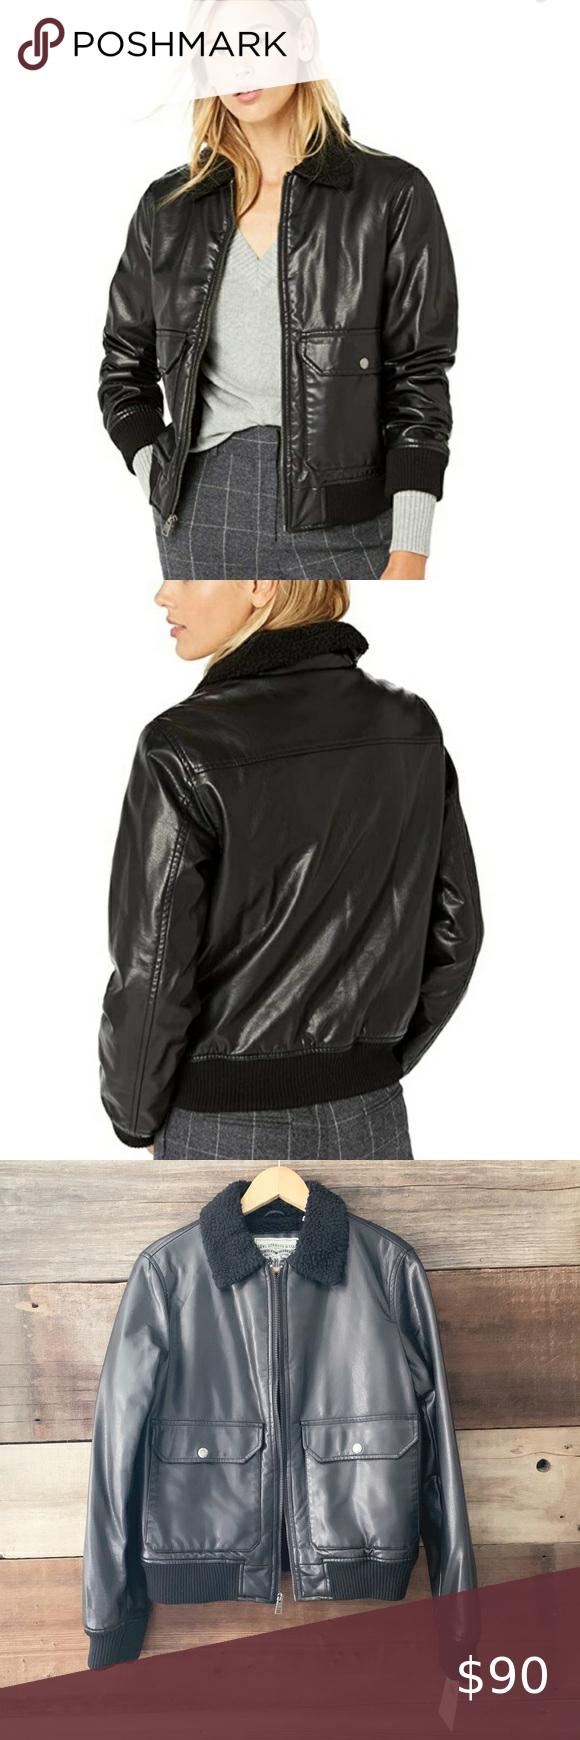 Levi S Black Faux Leather Sherpa Bomber Jacket Bomber Jacket Black Bomber Jacket Black Faux Leather [ 1740 x 580 Pixel ]